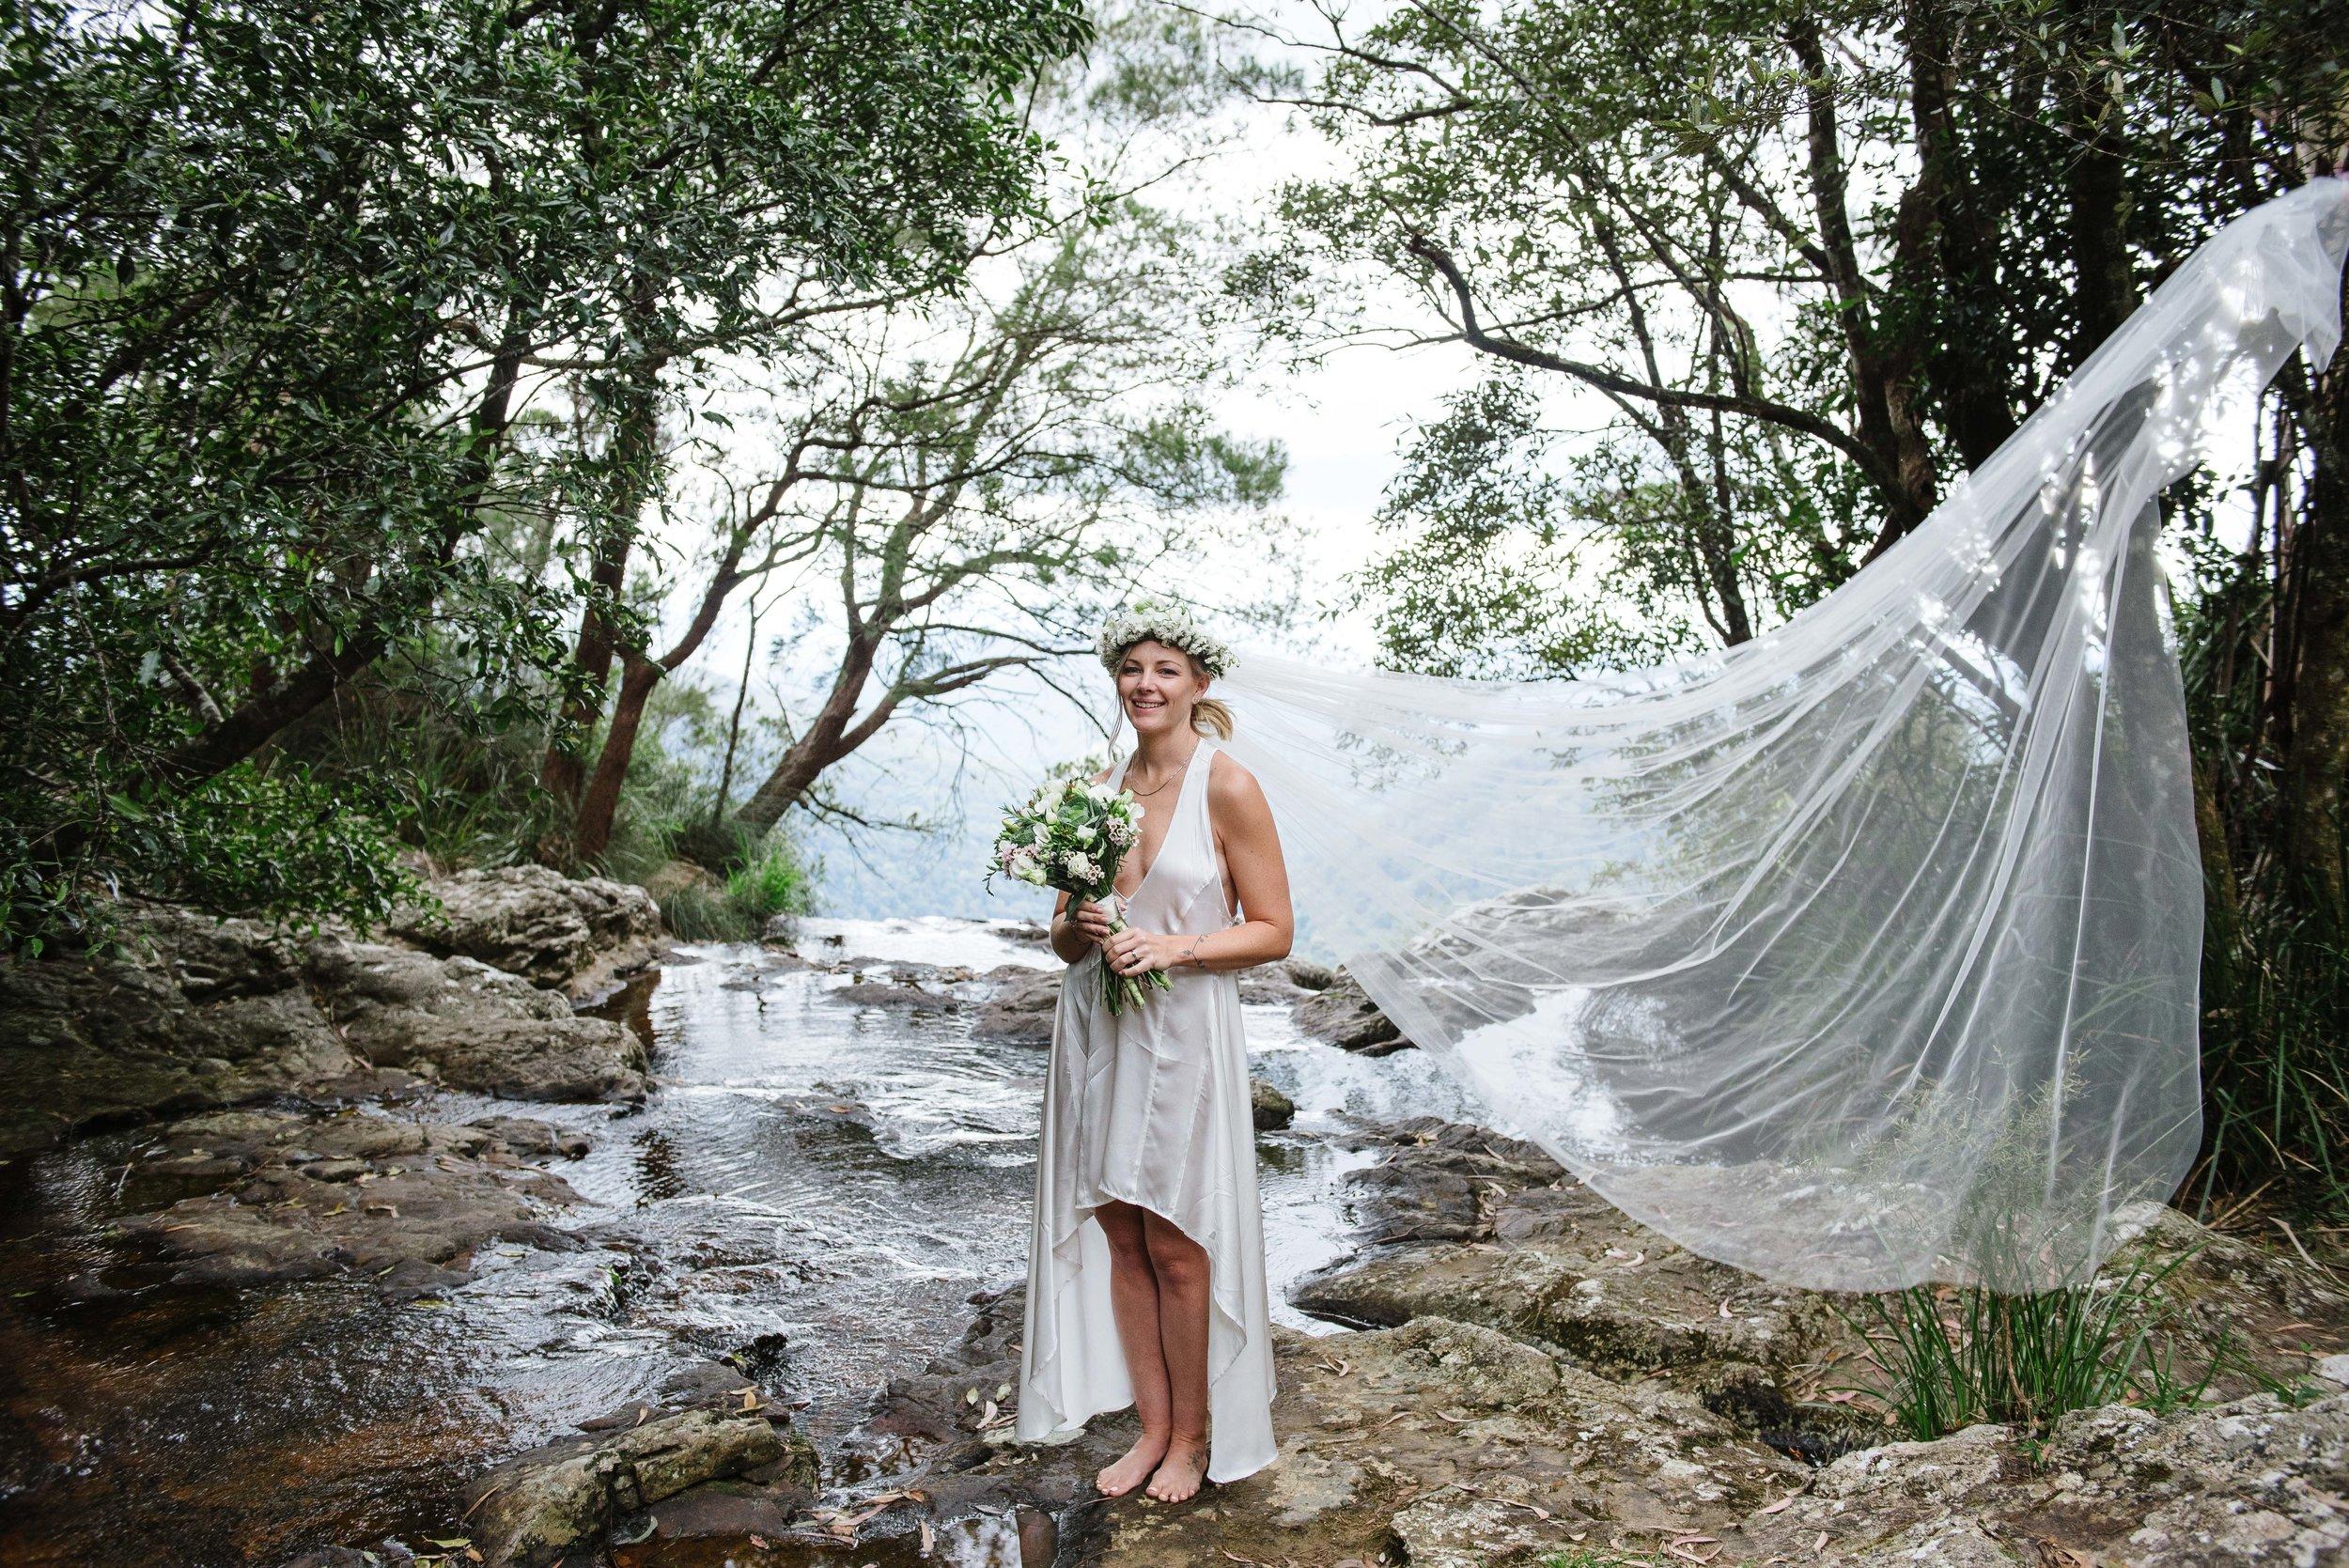 Carla and Luke- wedding photographer, byron bay wedding and family photographer, tweed heads wedding and family photography-304.jpg